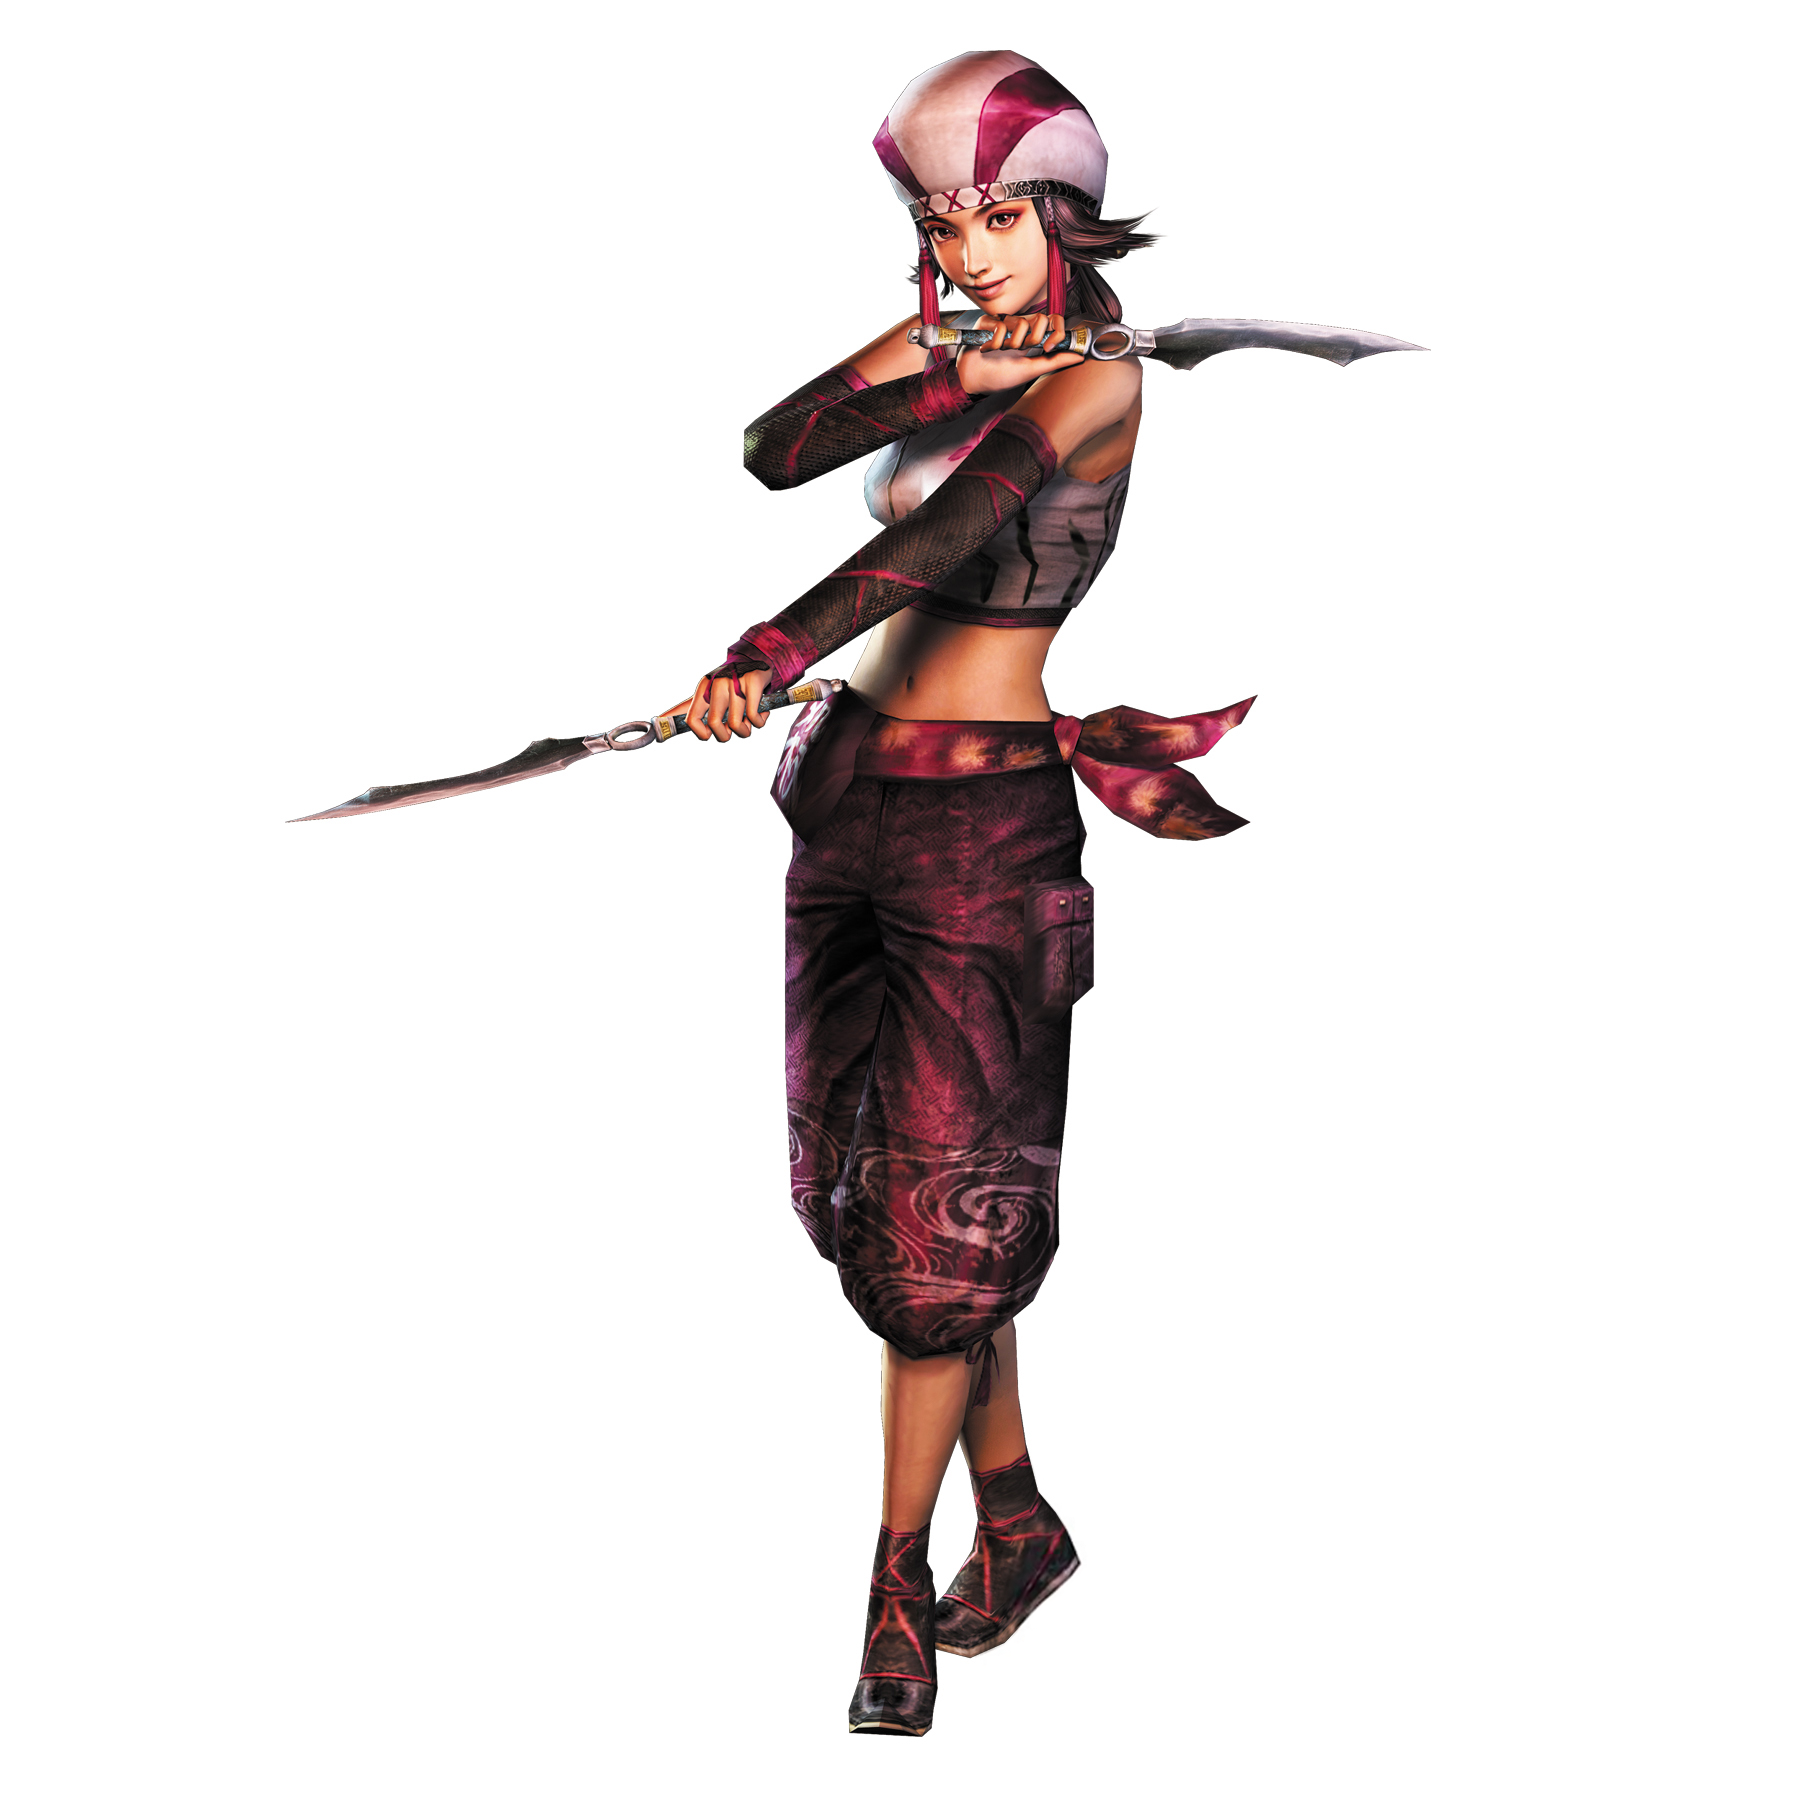 Warriors Orochi 3 Weapons